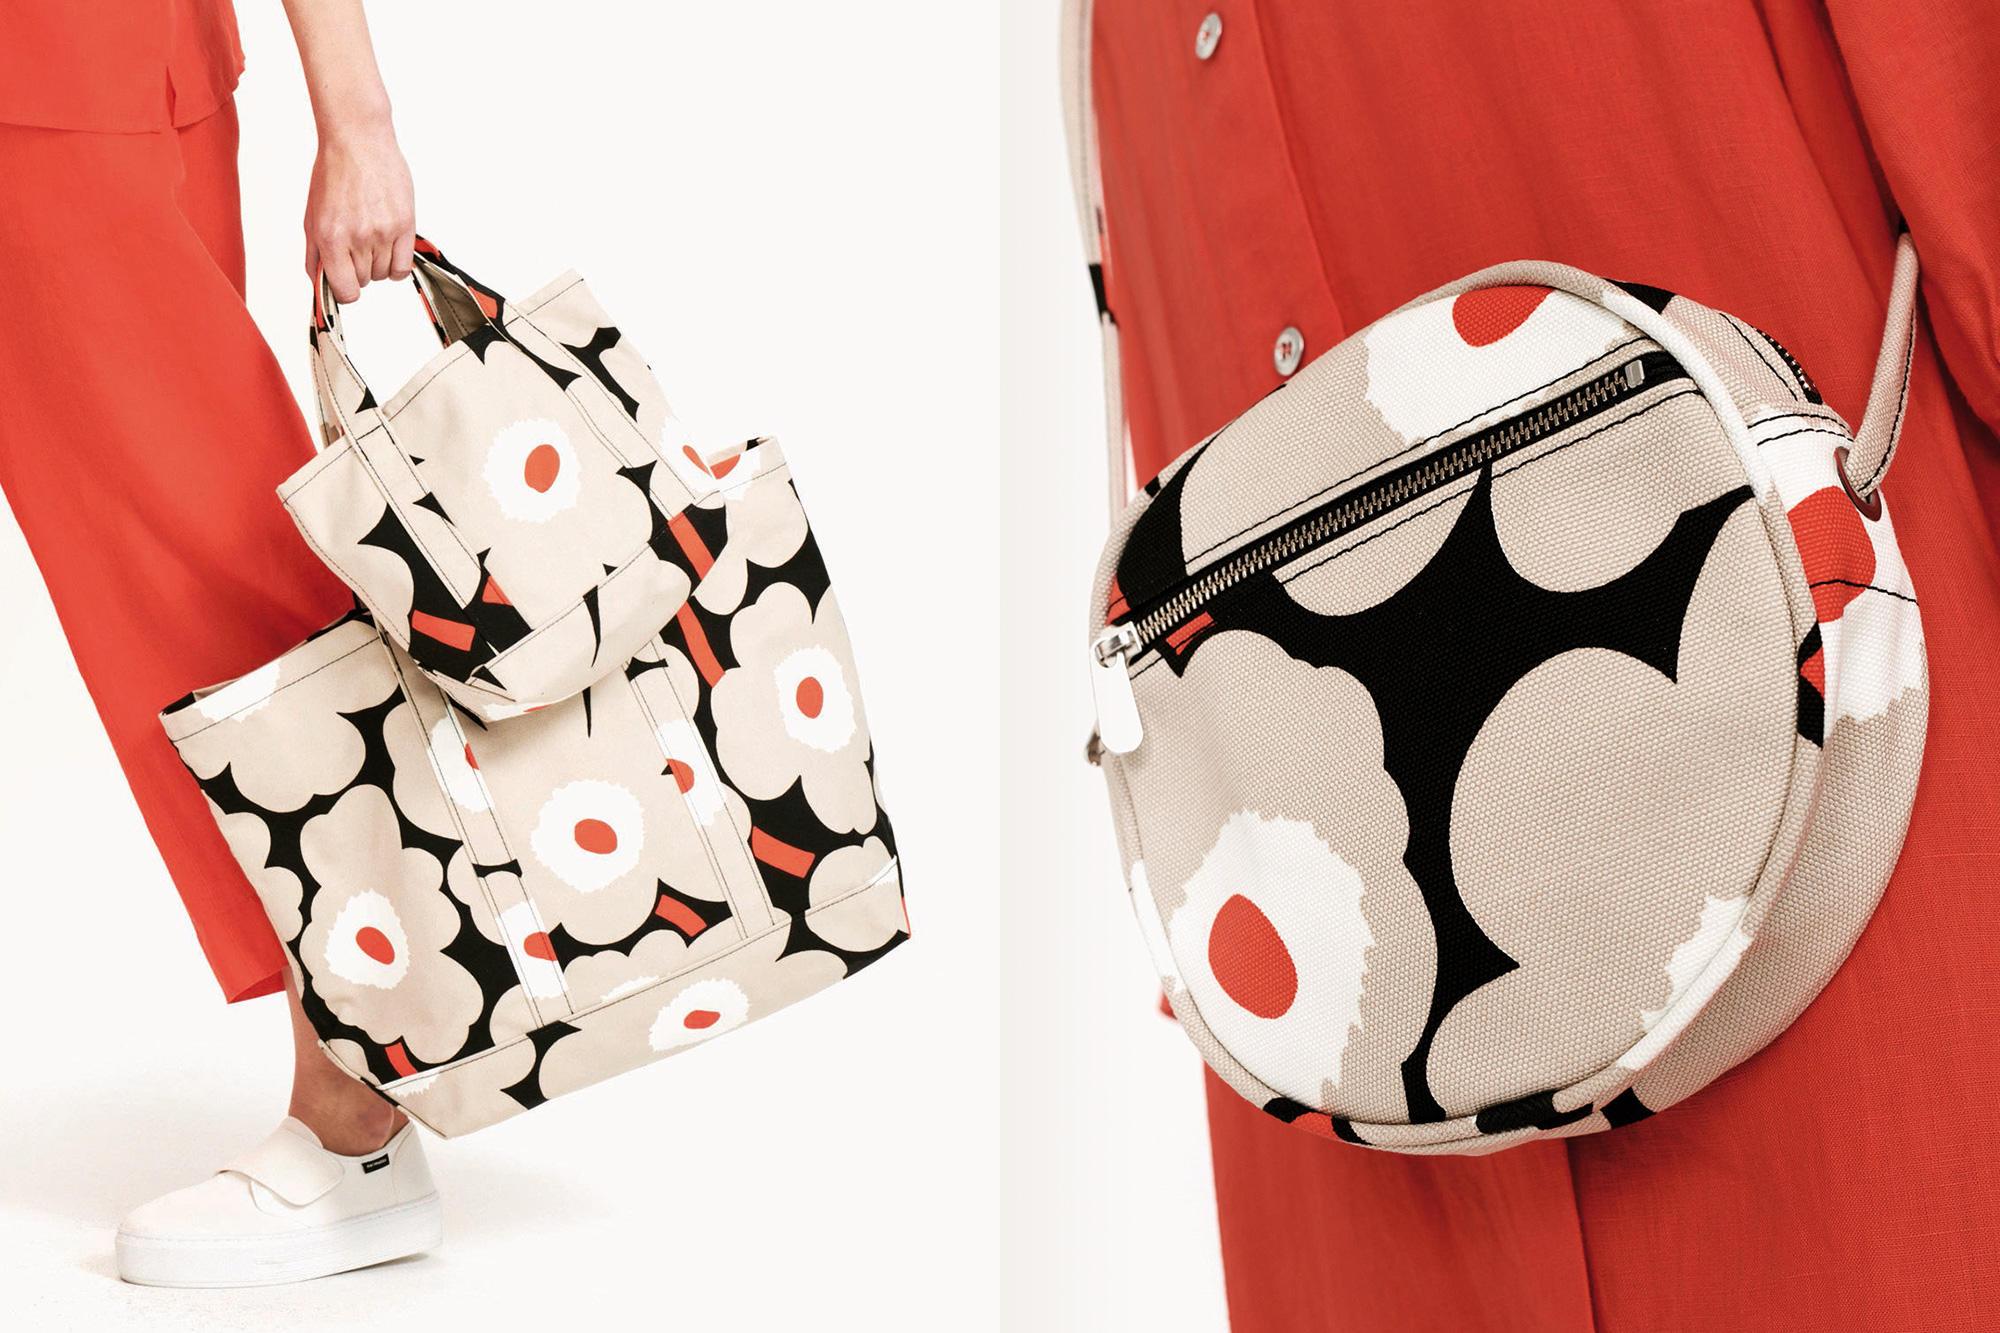 6.14- New Unikko Bags